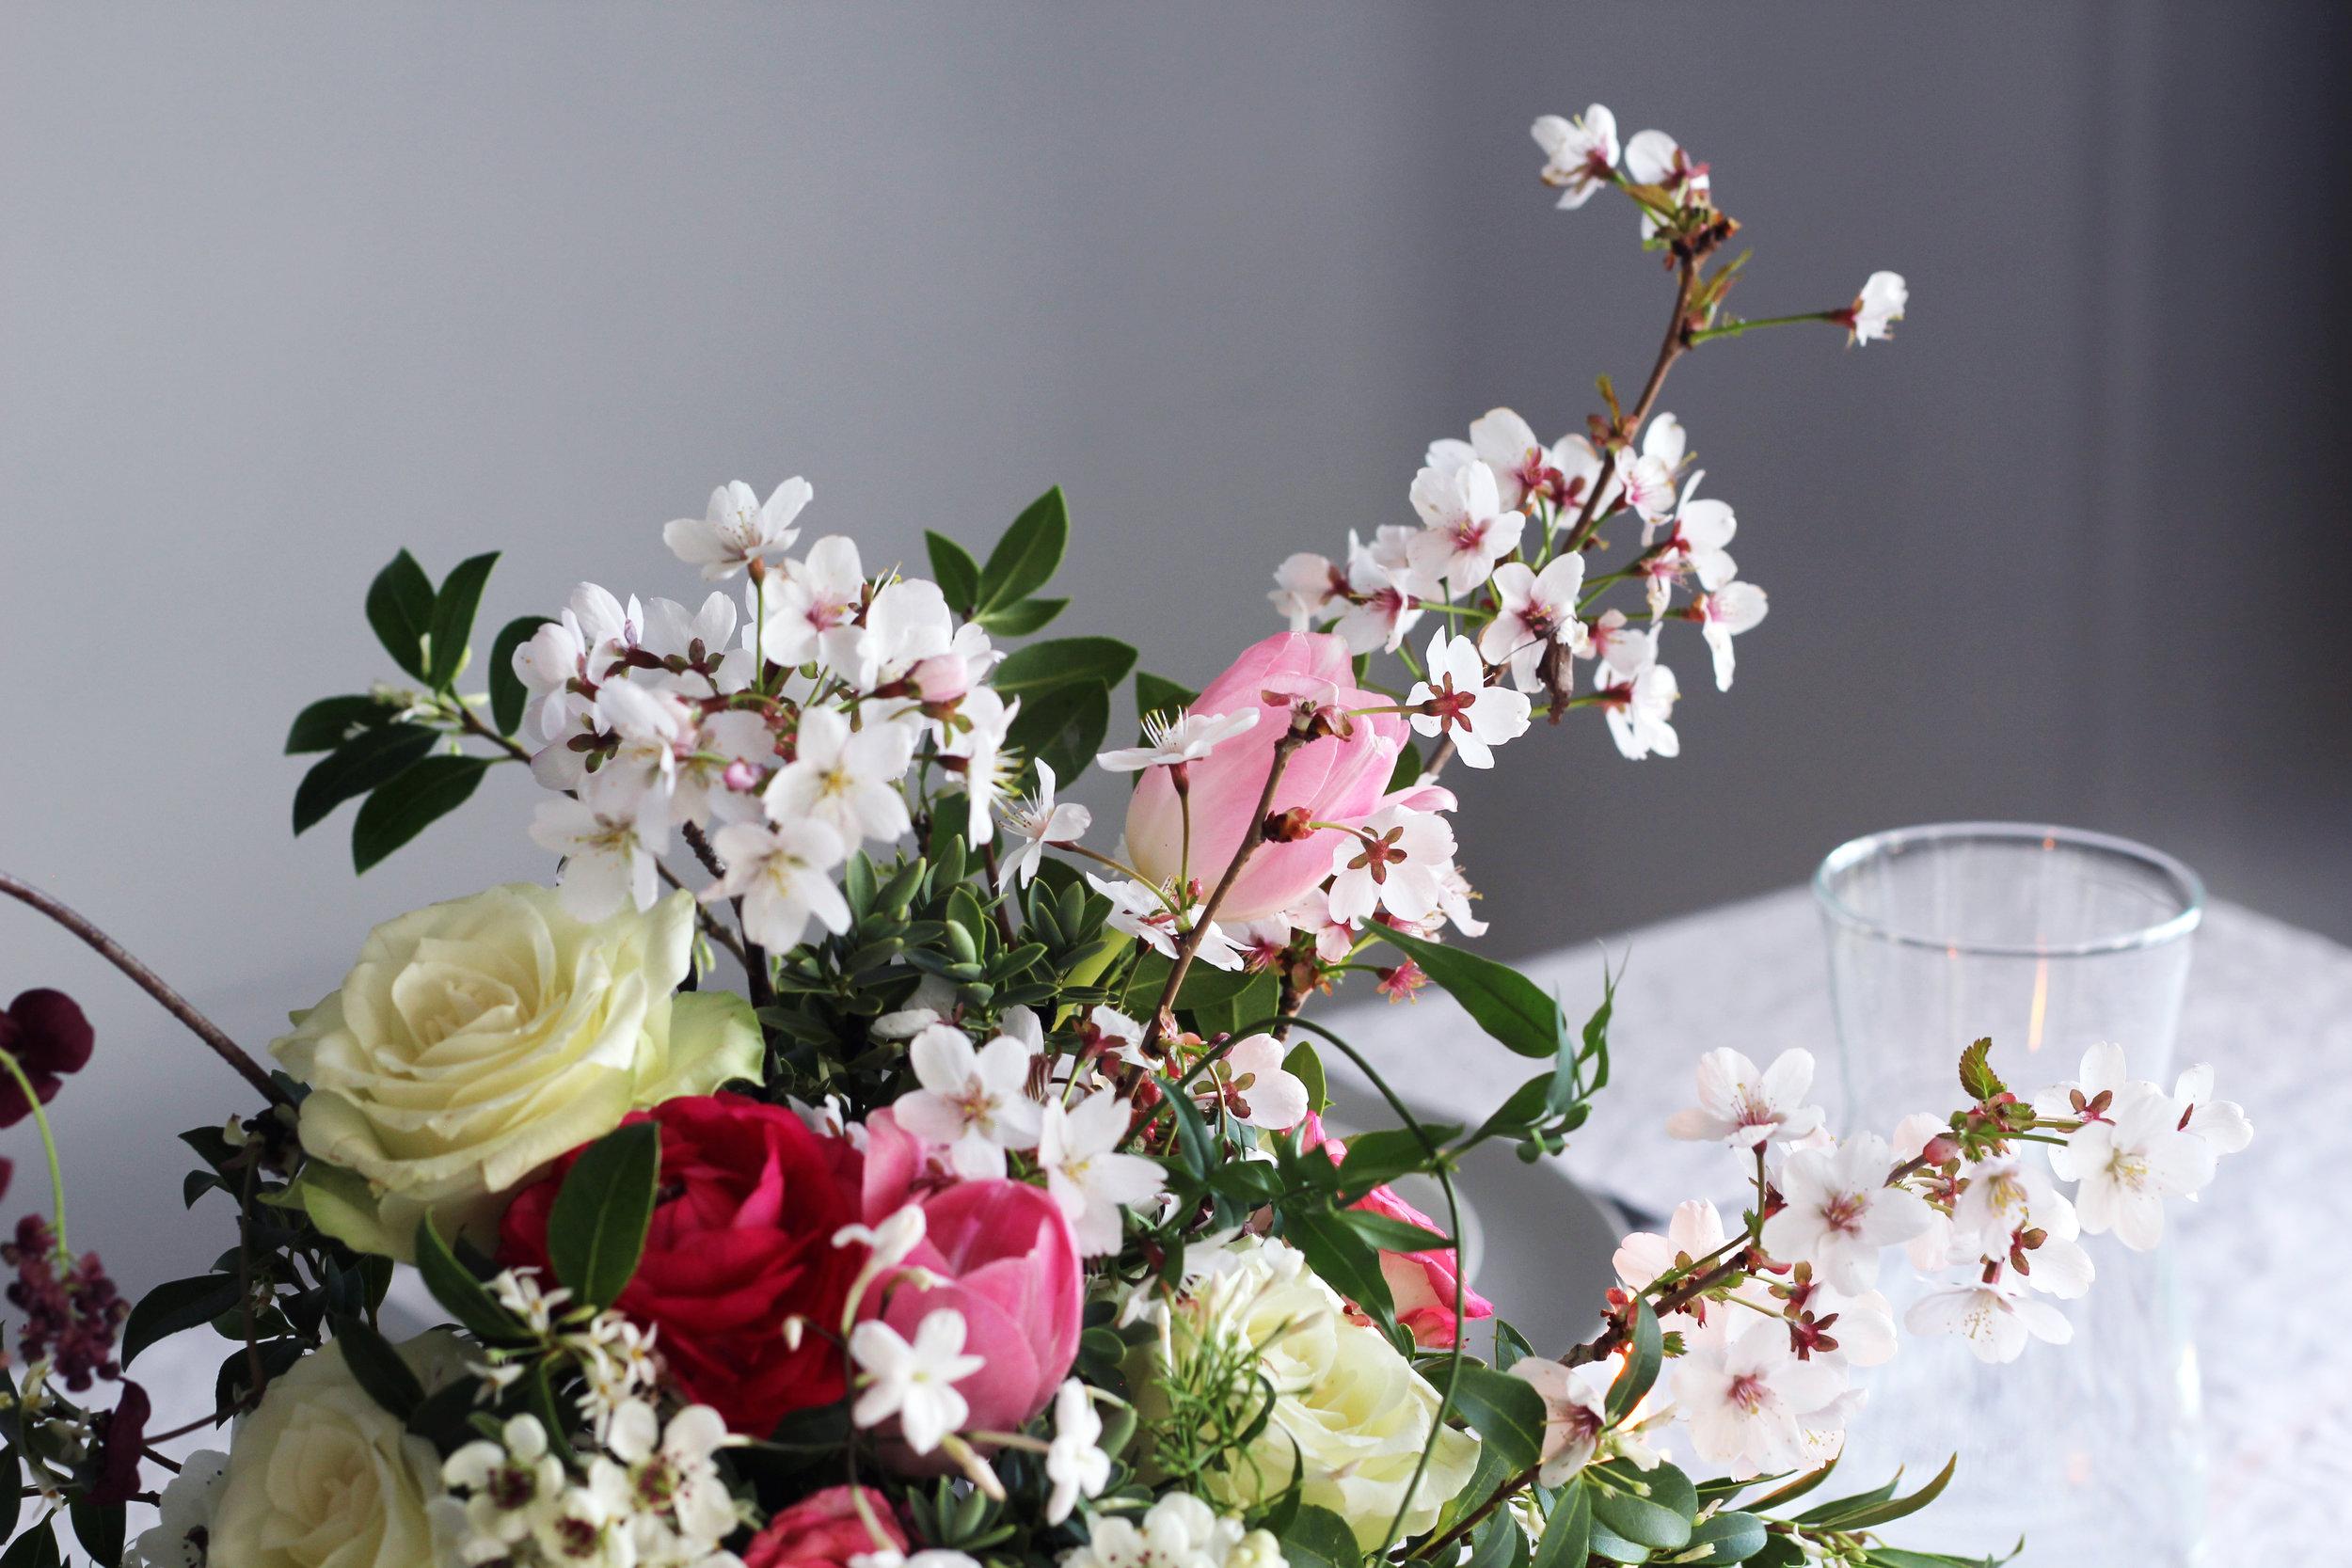 Callie-Pettigrew-Springtime-Wedding-14.jpg